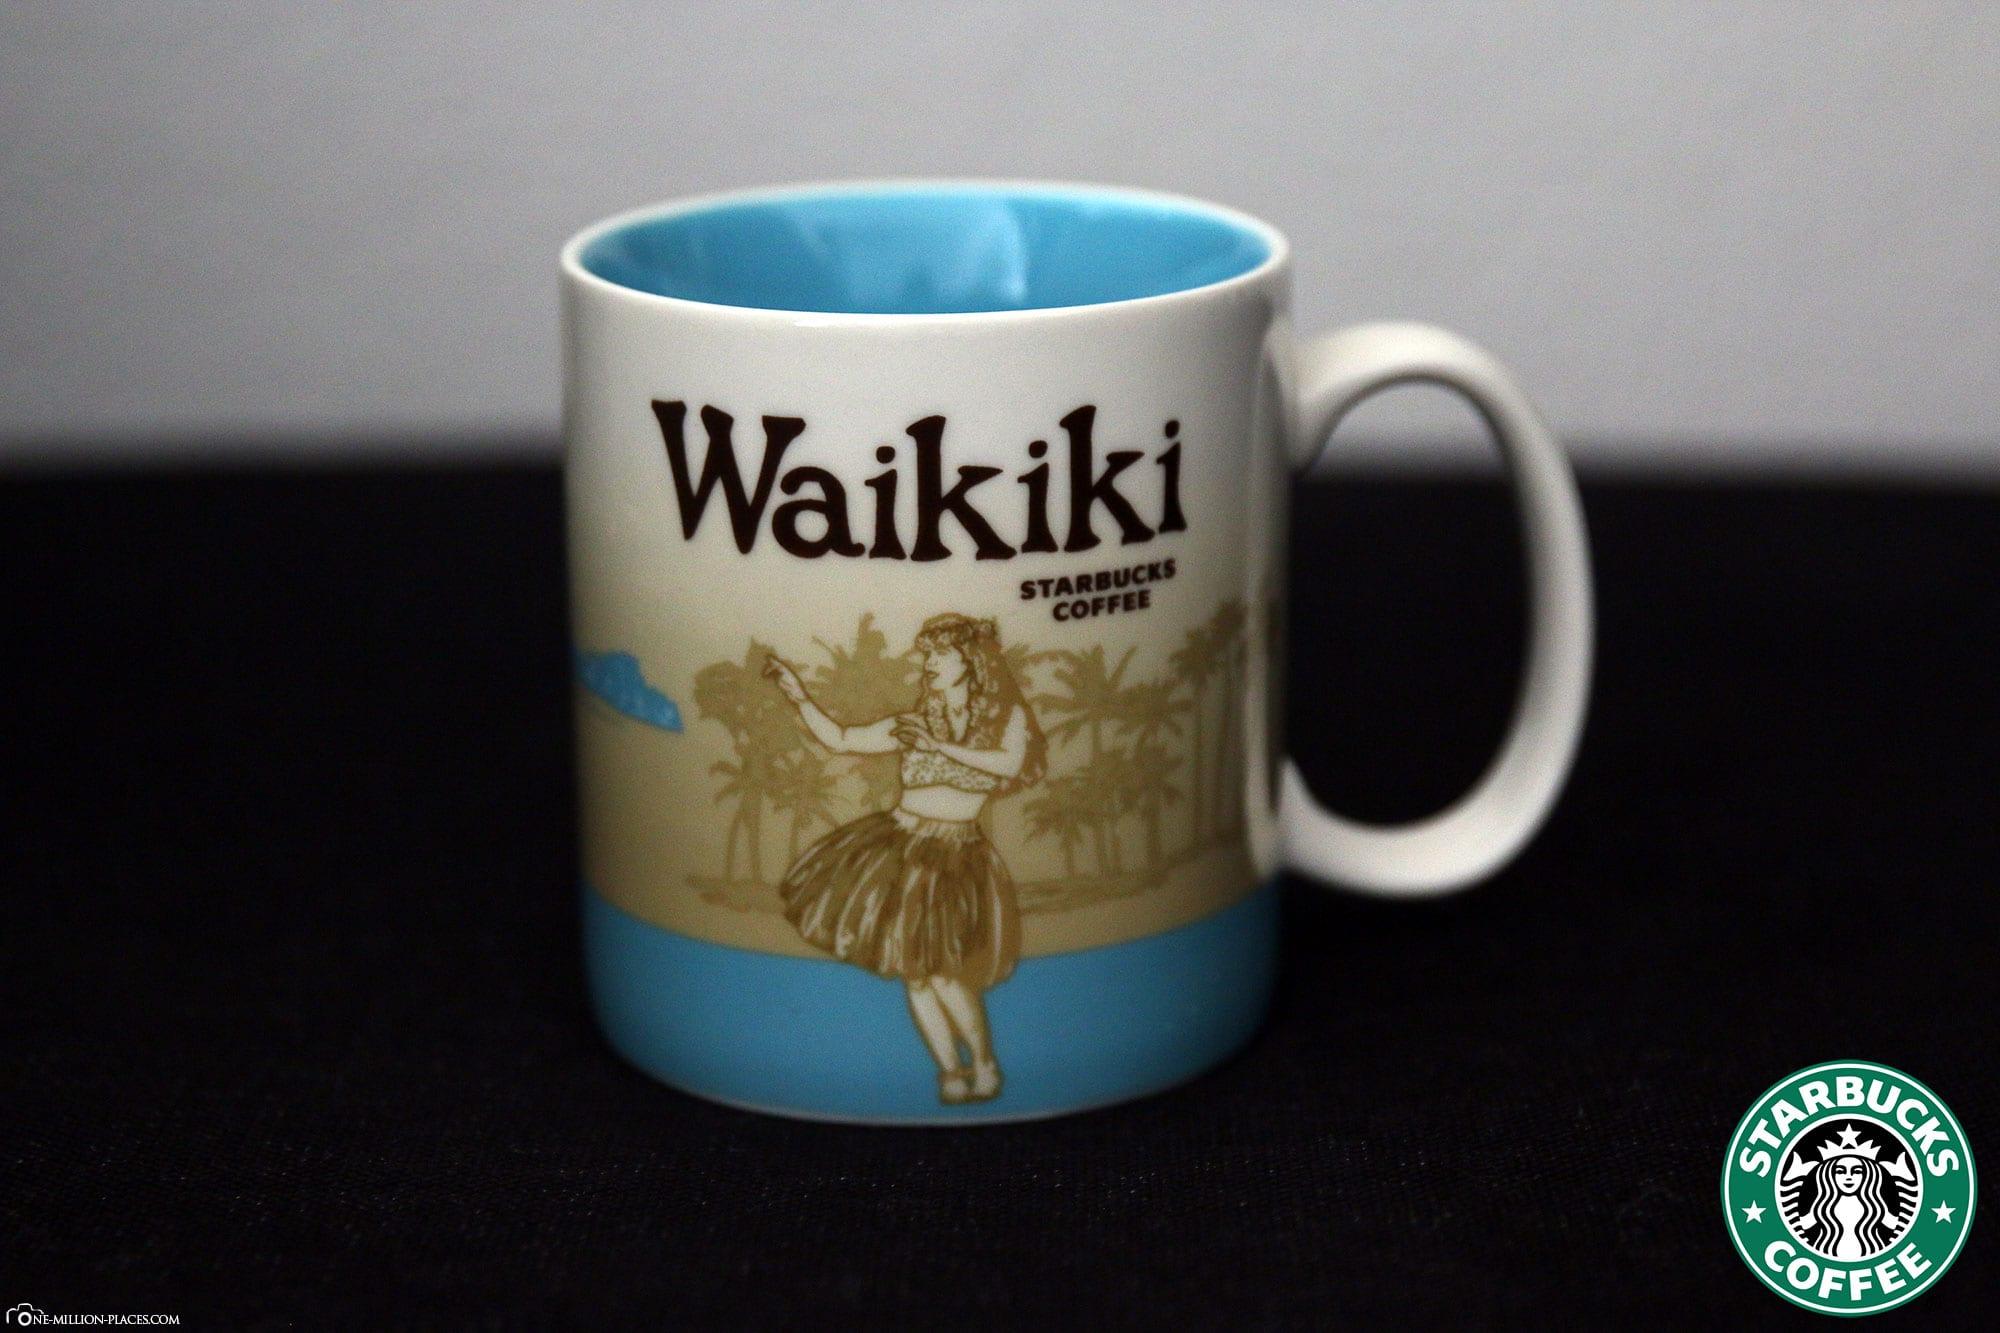 Waikiki, Starbucks Cup, Global Icon Series, City Mugs, Collection, Hawaii, Travelreport